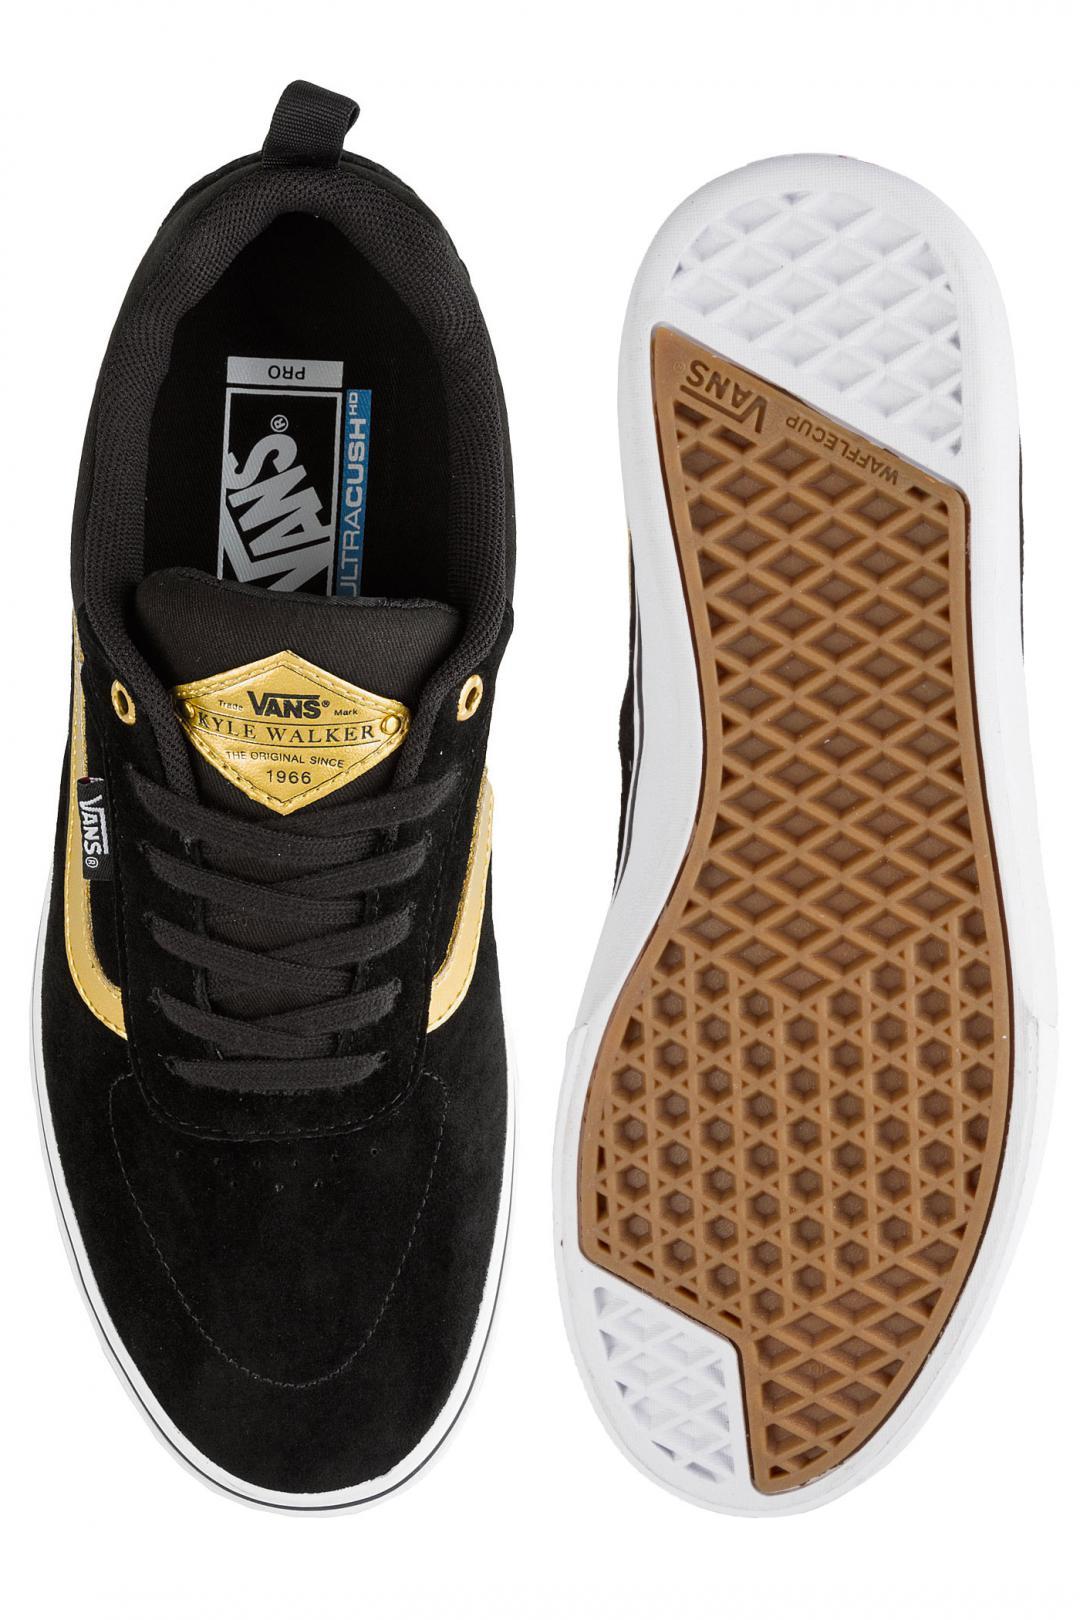 Uomo Vans Kyle Walker Pro black metall | Sneakers low top